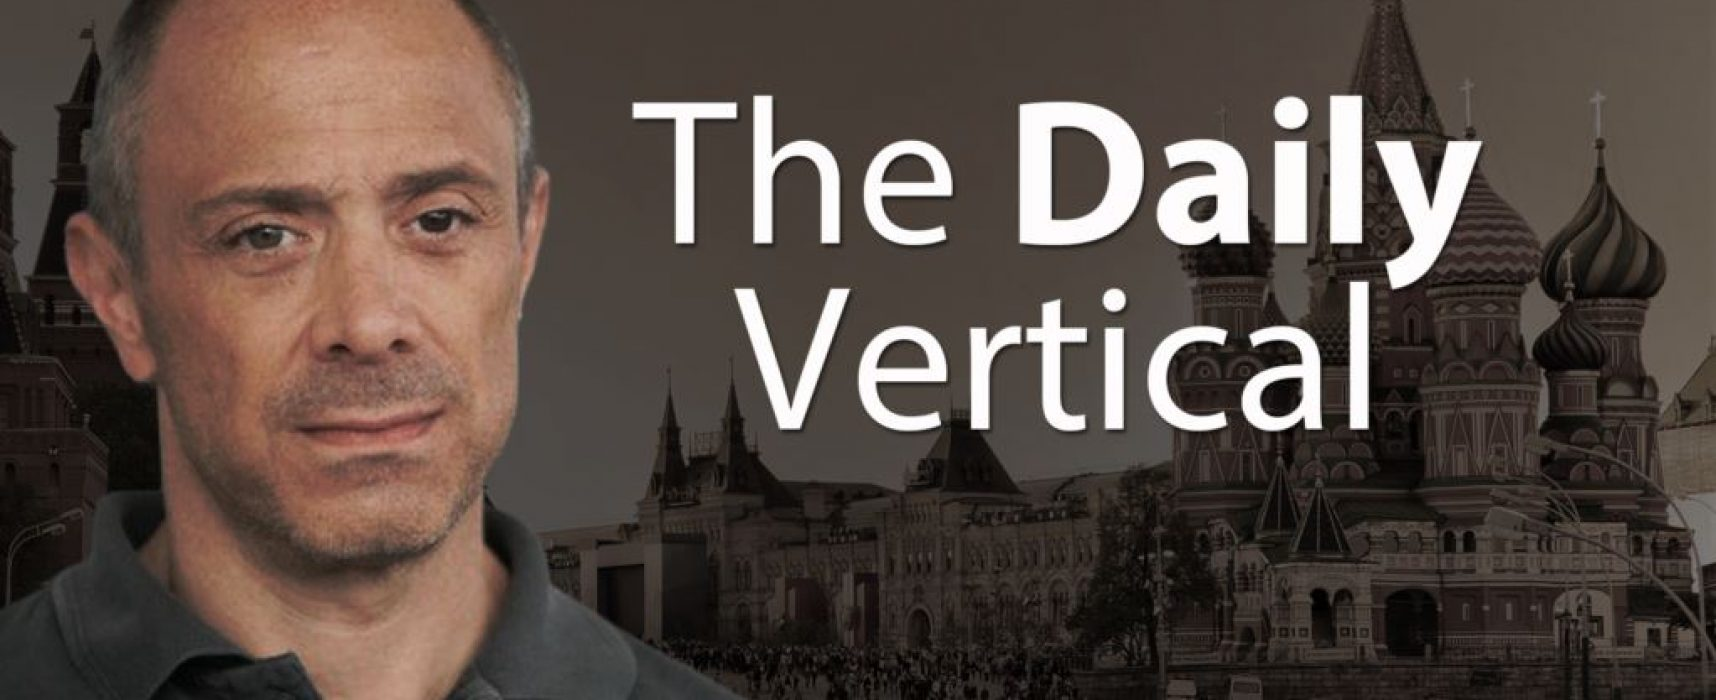 The Daily Vertical: Natural Born Liar (Transcript)